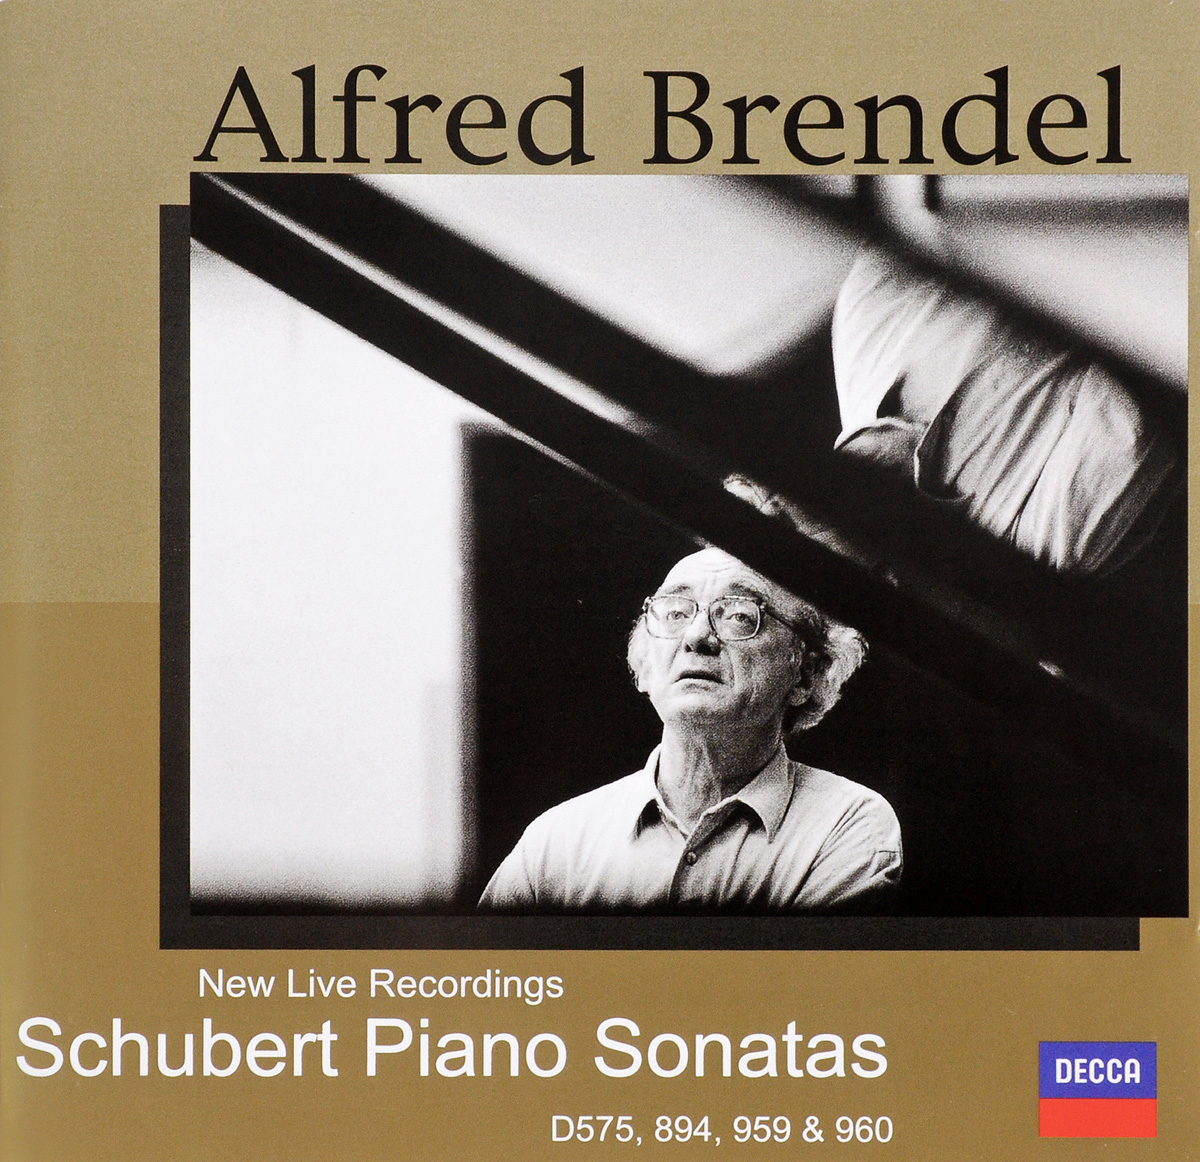 Альфред Брендель Alfred Brendel. Schubert: Piano Sonatas Nos. 9, 18, 20, & 21 (2 CD) альфред брендель alfred brendel schubert complete impromptus